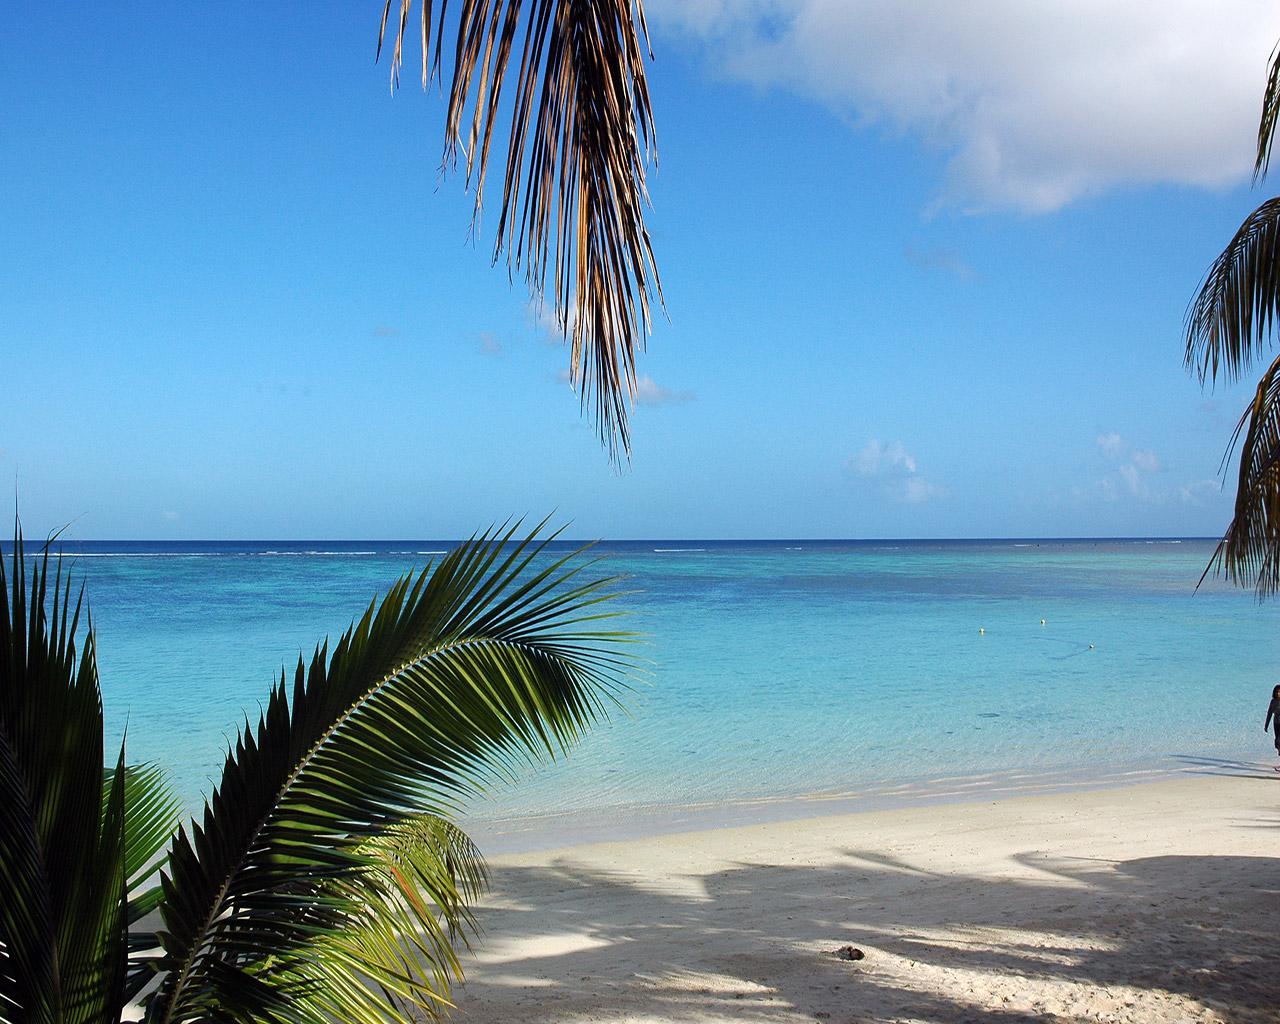 http://3.bp.blogspot.com/-aGmA1P-3EiM/UD10MXYCXgI/AAAAAAAAKCU/9tPd-Vr4H4A/s1600/Mauritius2.jpg